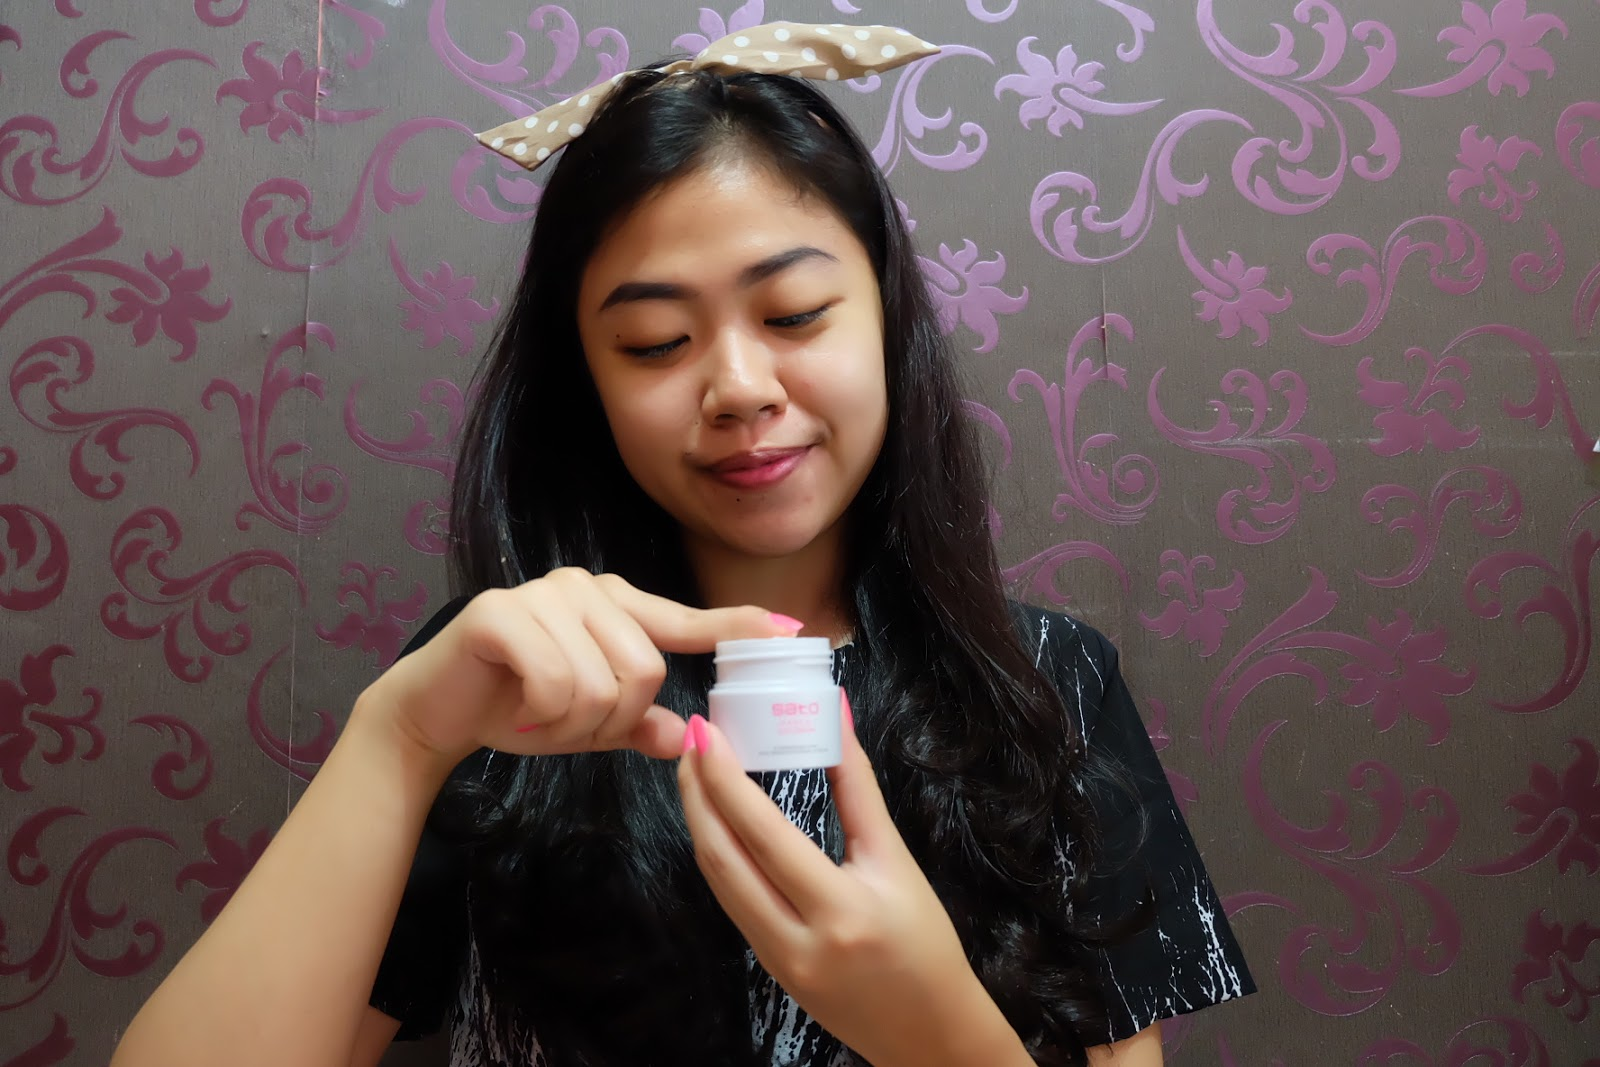 Review Sato Hakubi Rangkaian Produk Kecantikan Dari Jepang Beauty Pastaron Cream